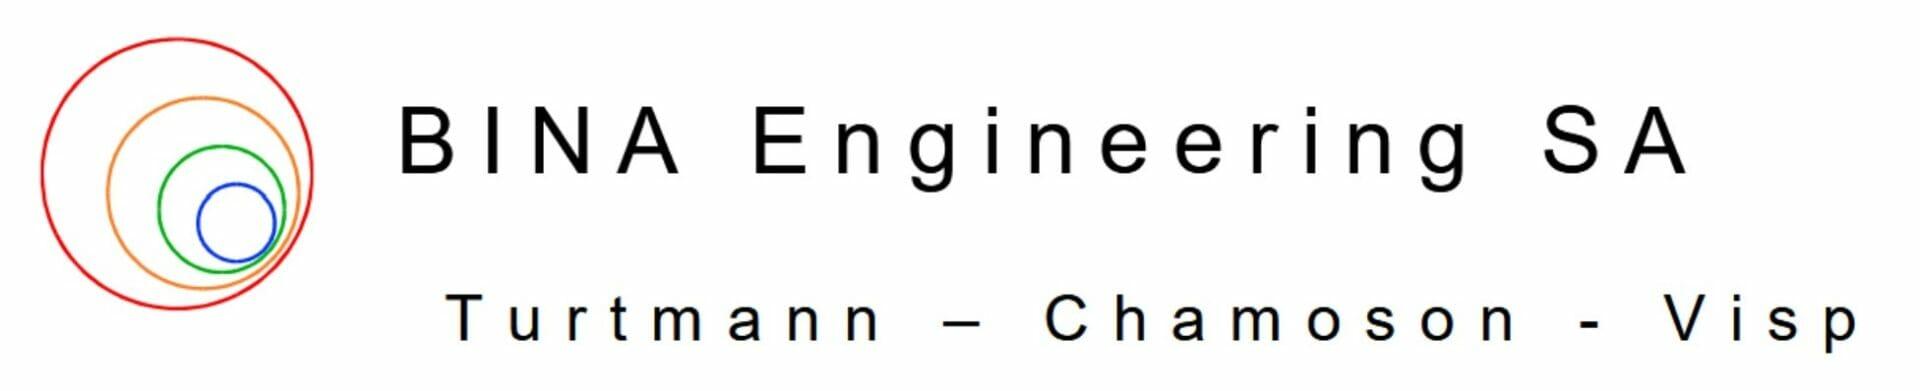 BINA Engineering SA